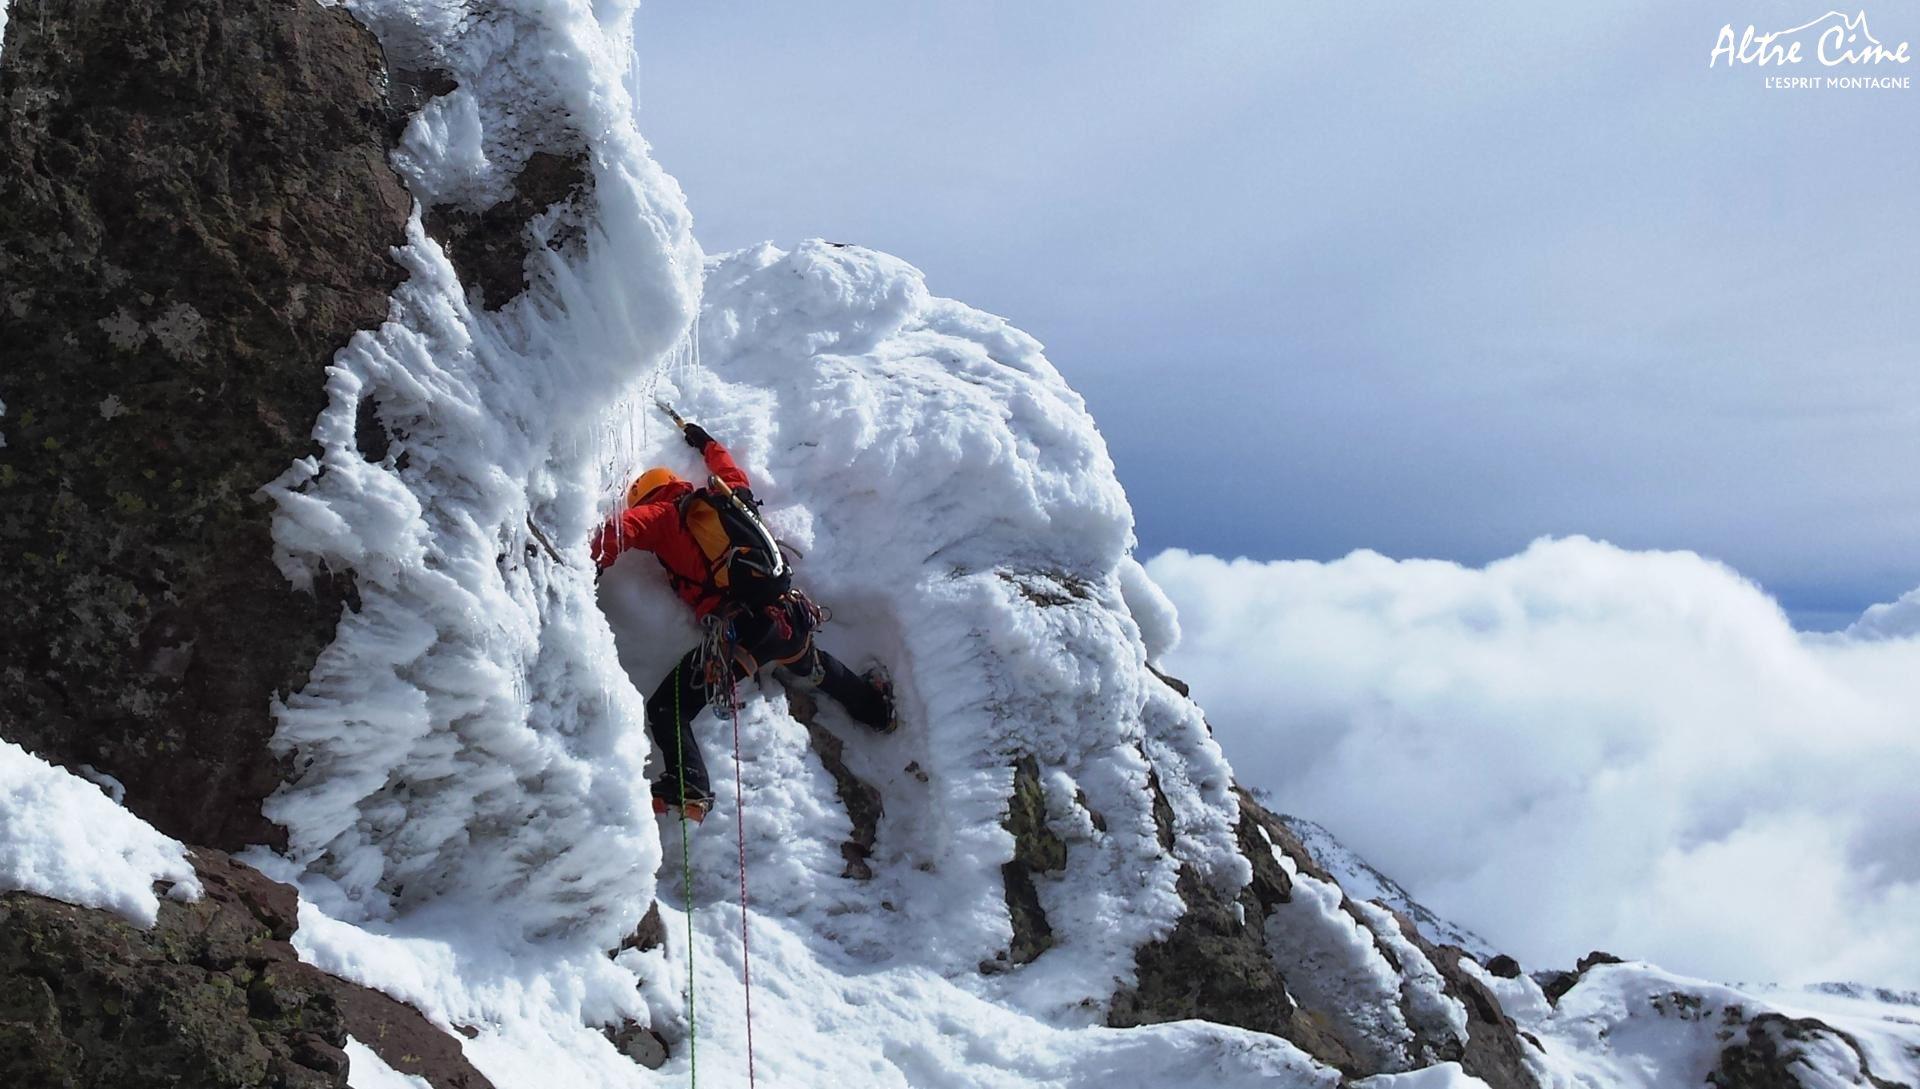 [Alpinisme en Corse] Capu Tafunatu meringué